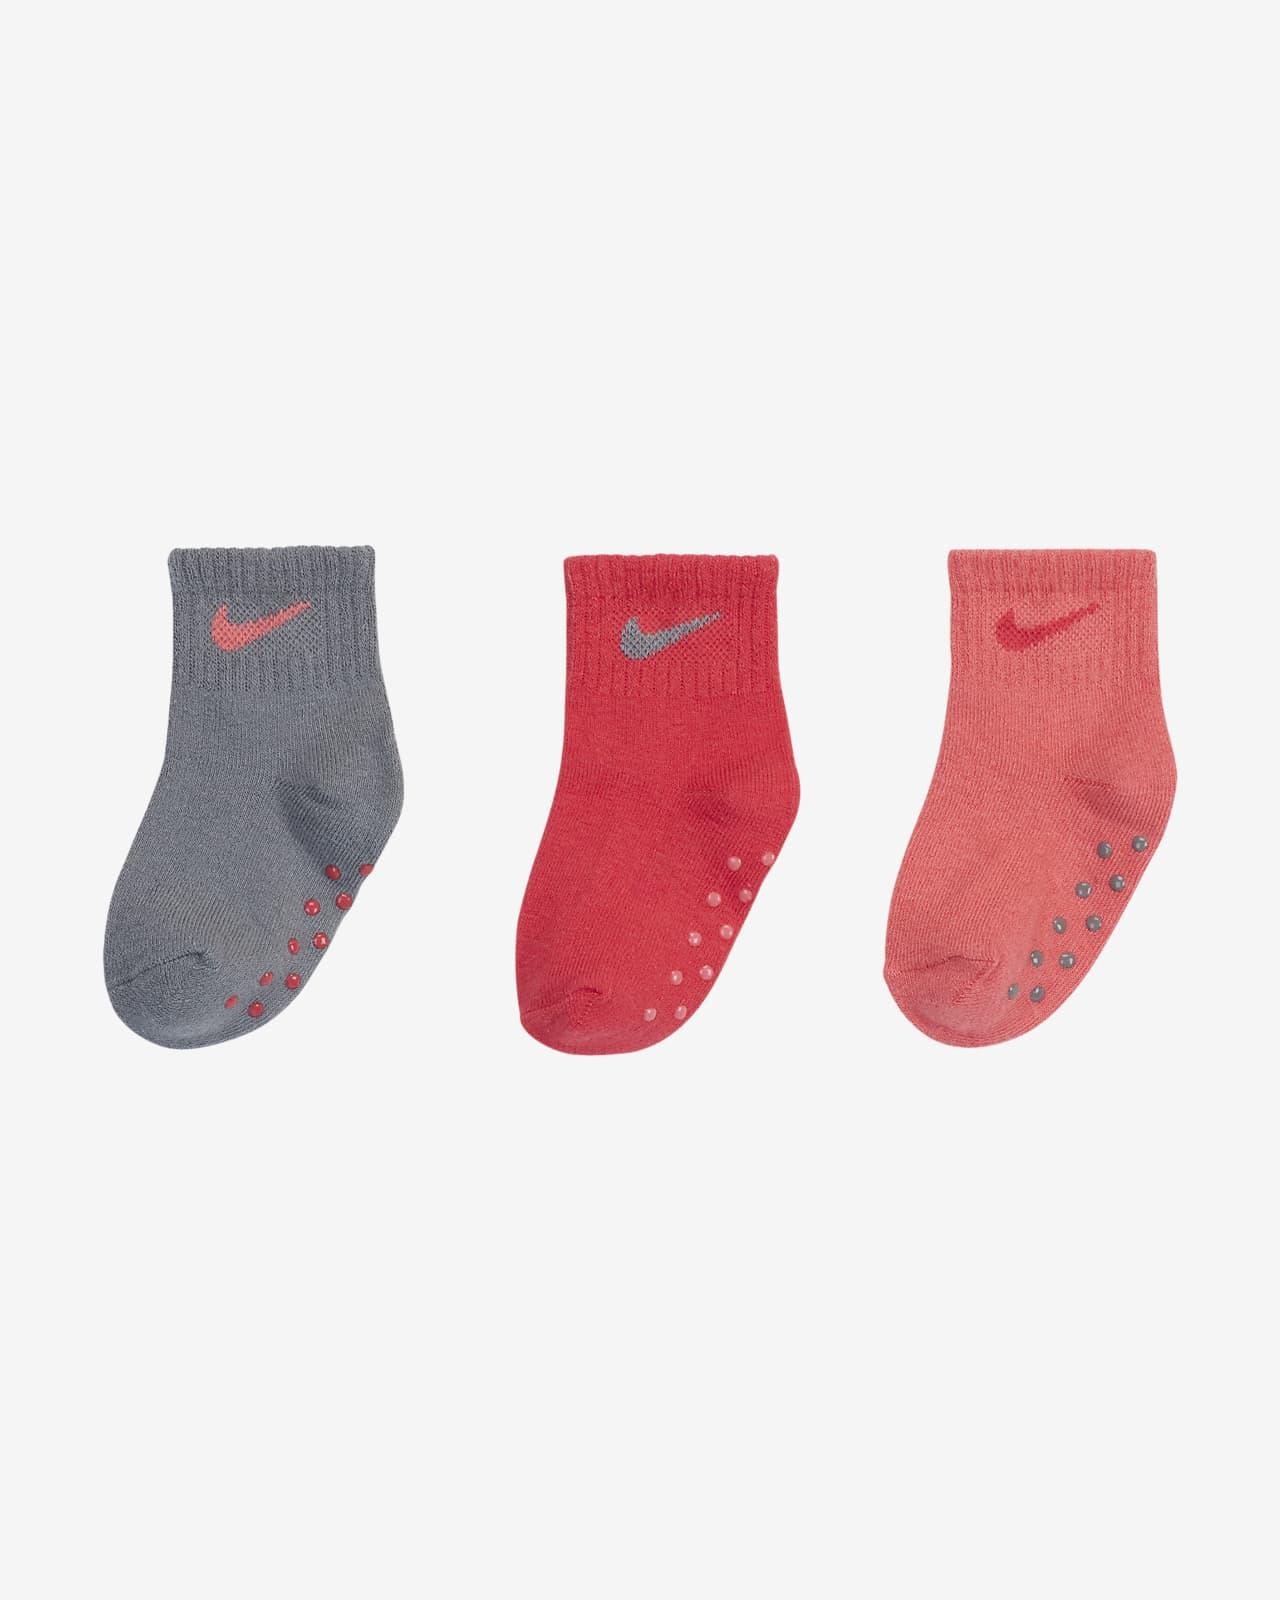 Nike Toddler Gripper Socks (3 Pairs)